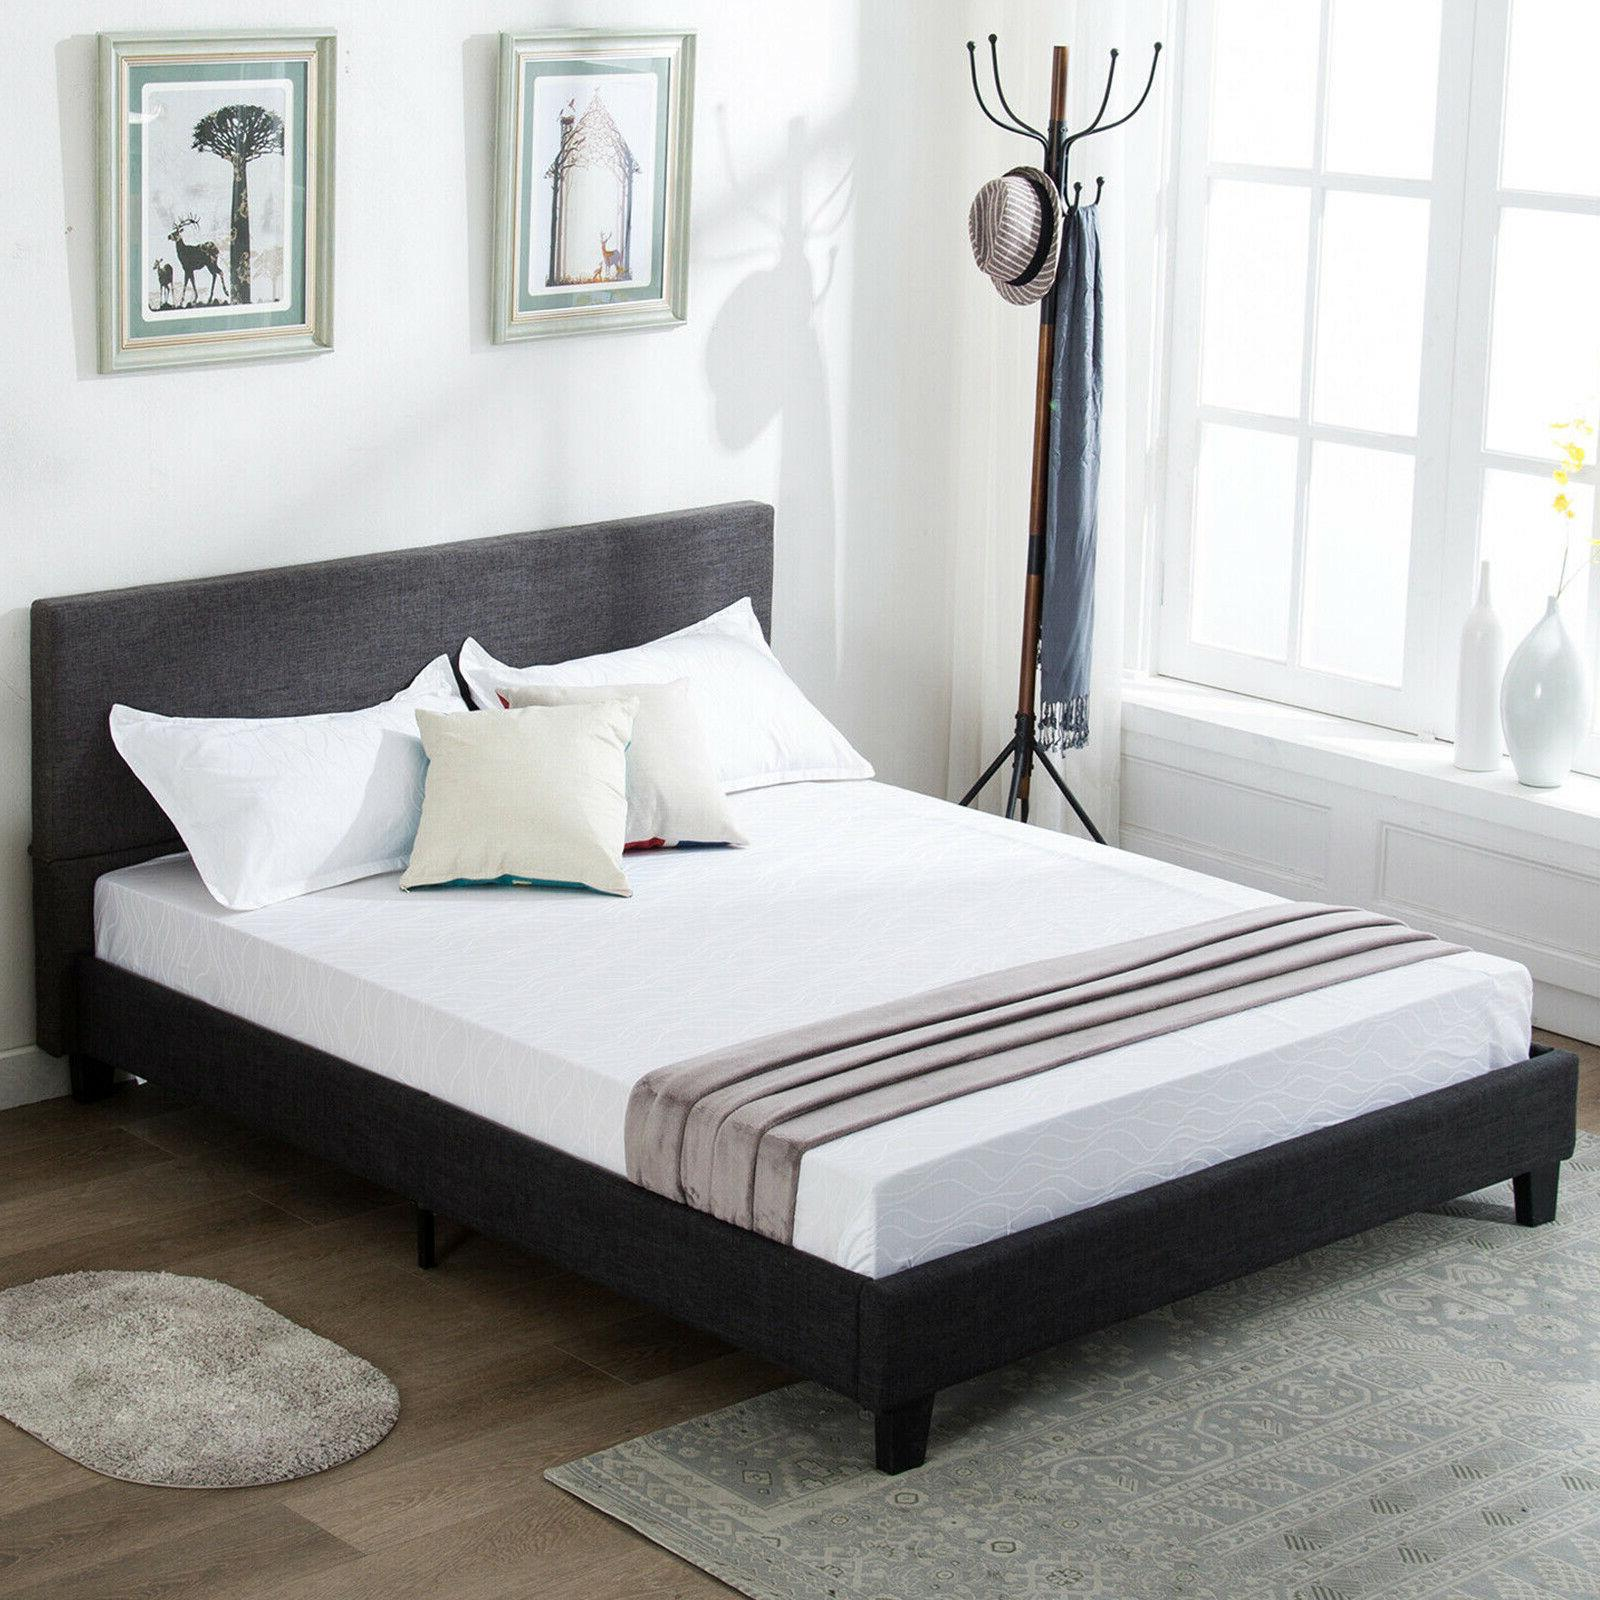 full size platform bed frame upholstered gray